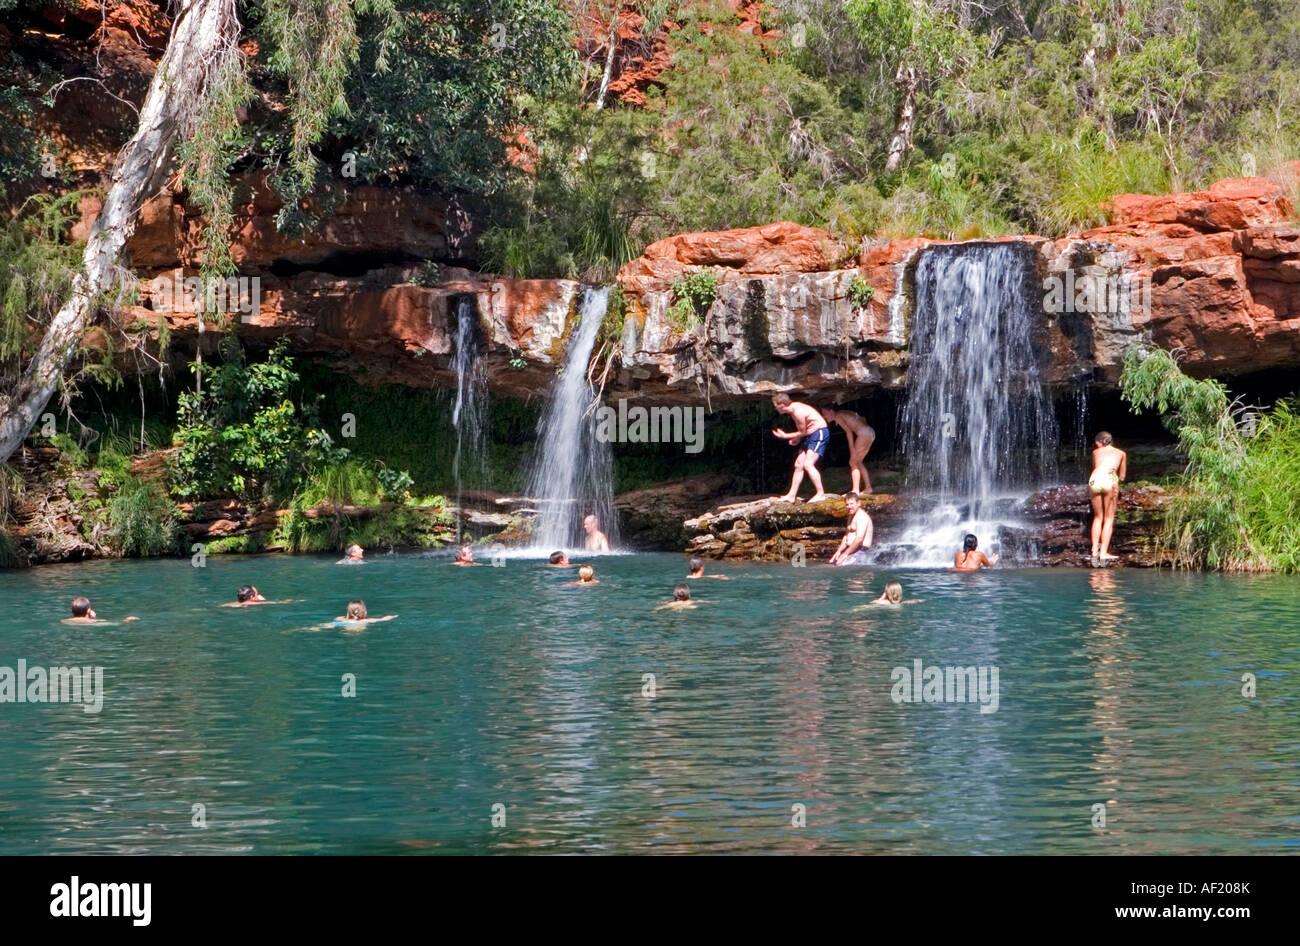 Fall Wallpaper For Windows Fern Pool In Karijini National Park Western Australia